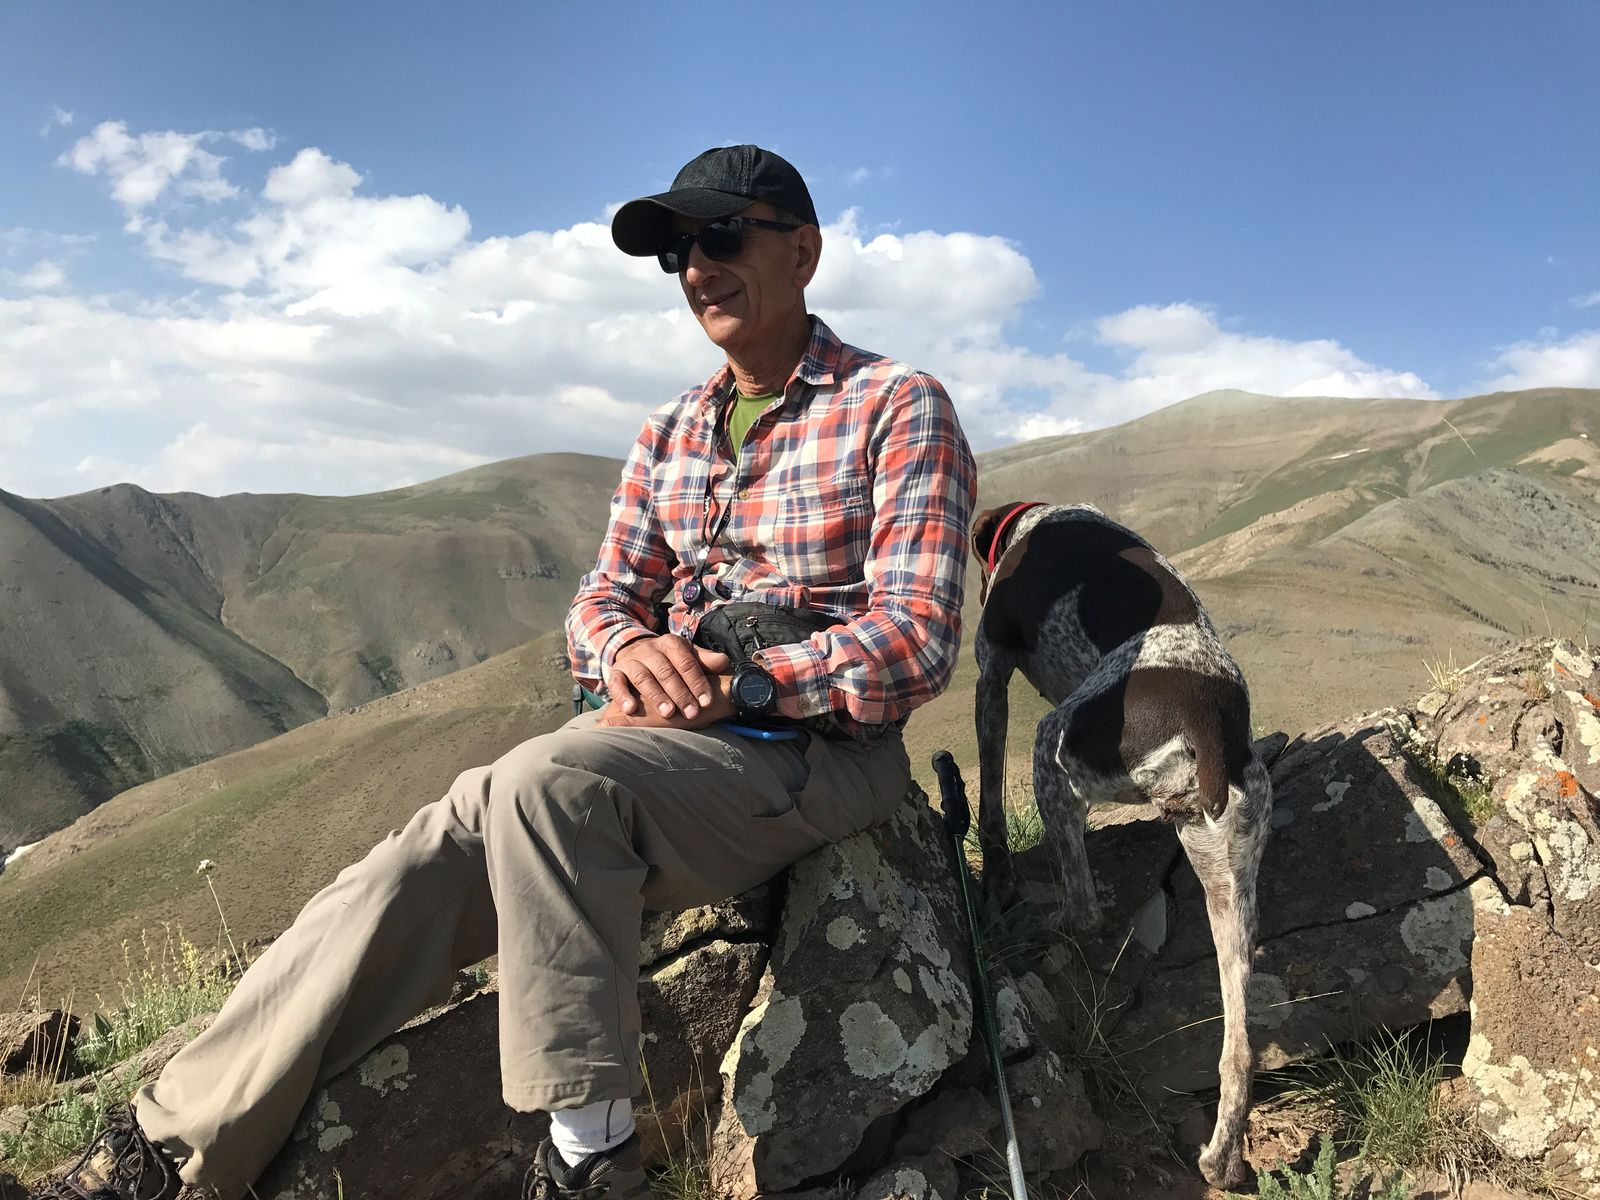 Naturschützer Kavous Seyed Emami